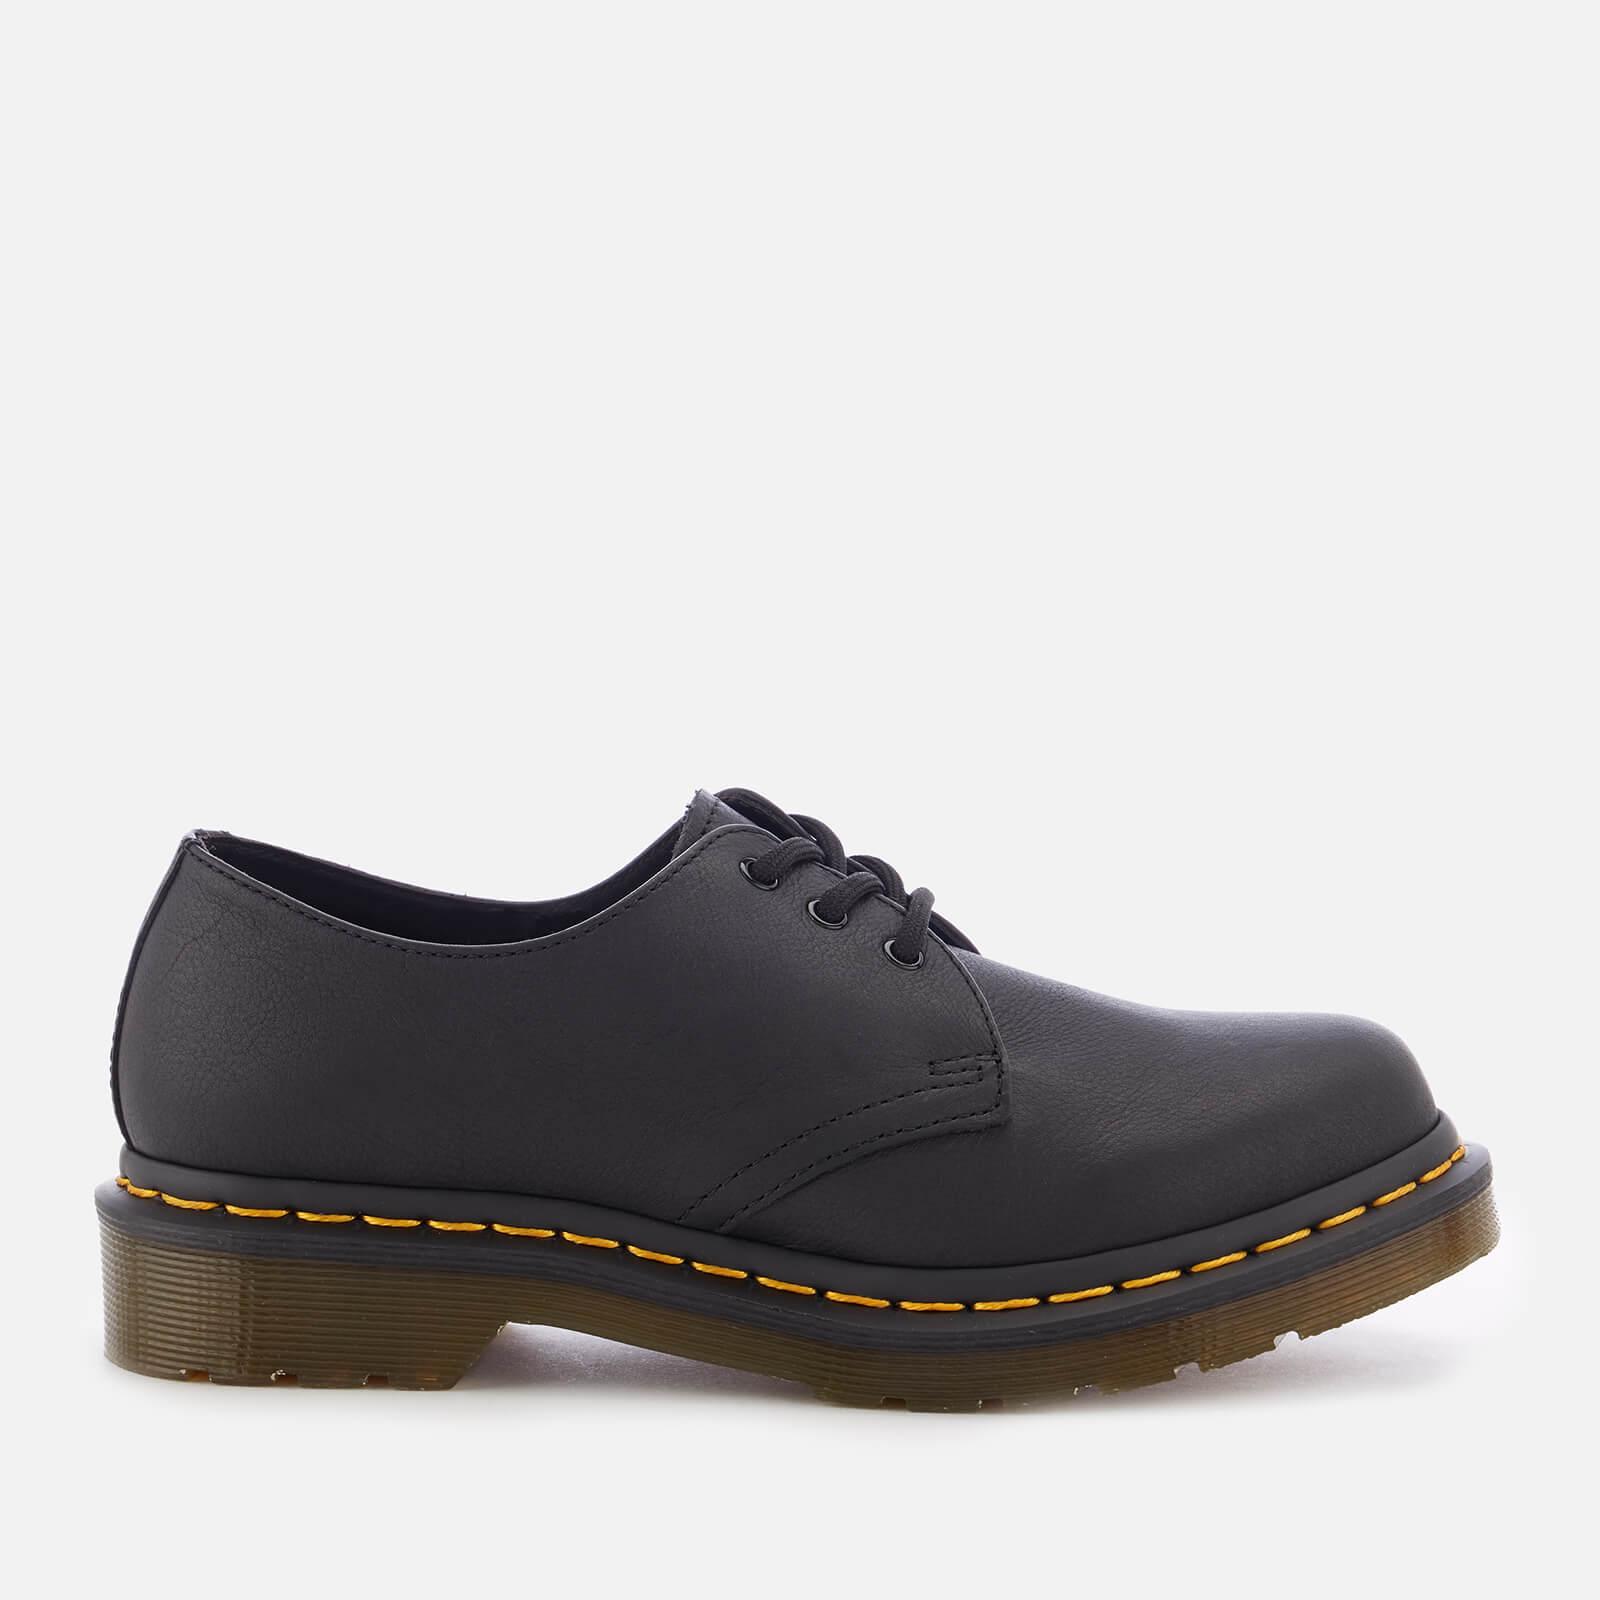 Dr. Martens Women's 1461 W Virginia Leather 3-Eye Shoes - Black - UK 7 - Black